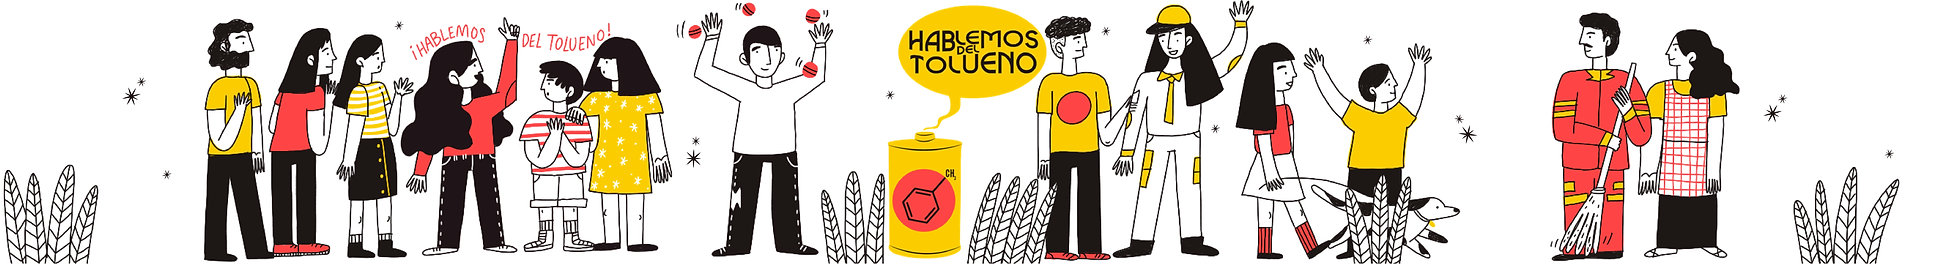 Hablemos del tolueno-01.jpg